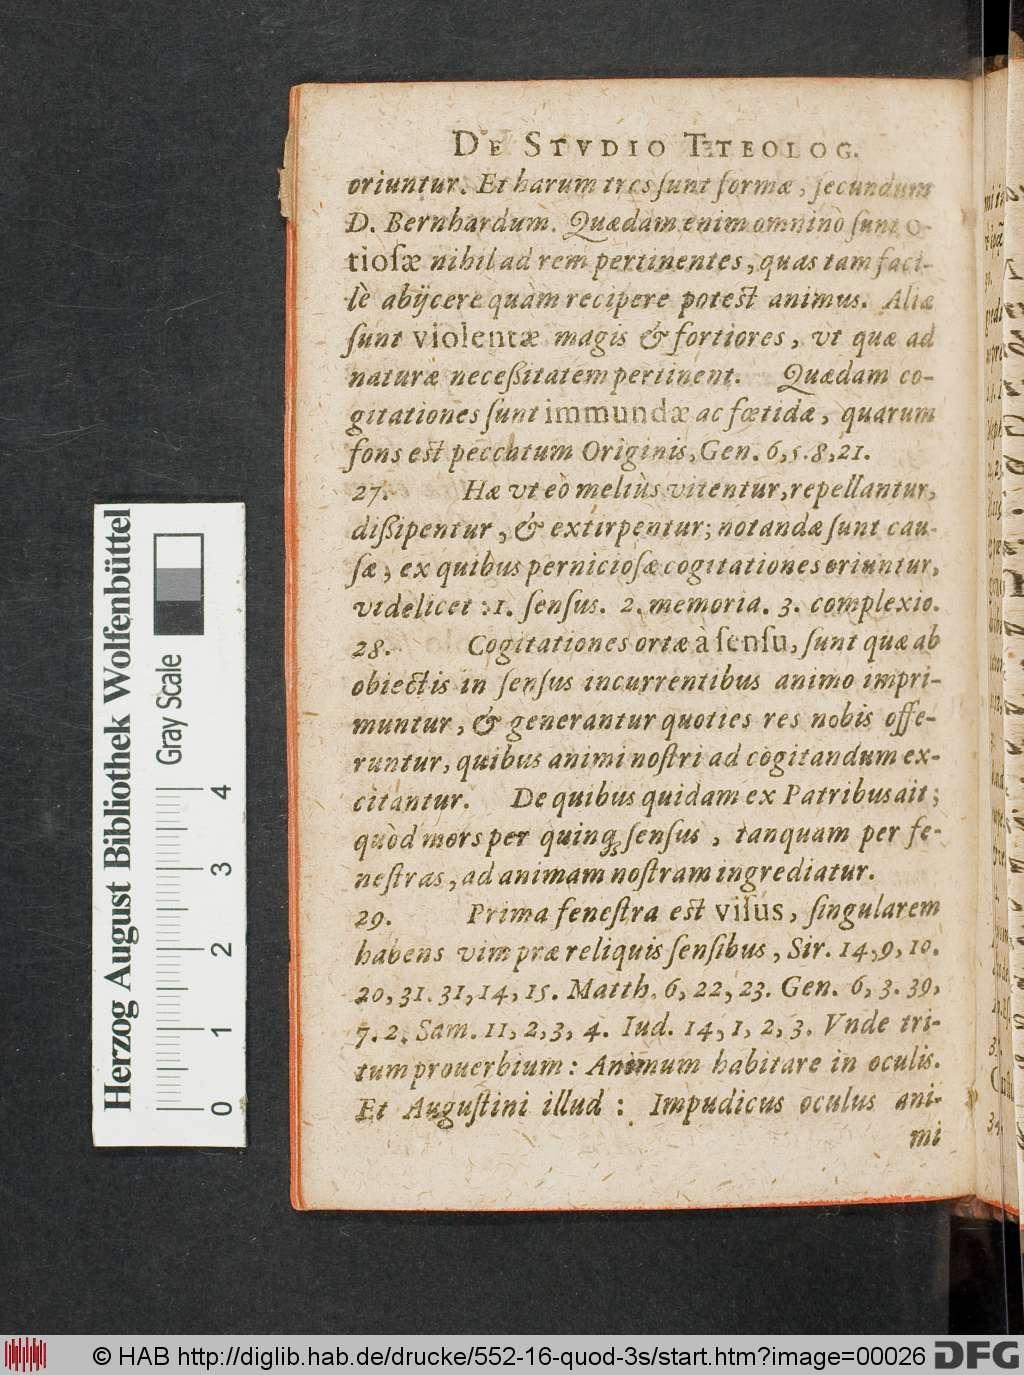 http://diglib.hab.de/drucke/552-16-quod-3s/00026.jpg